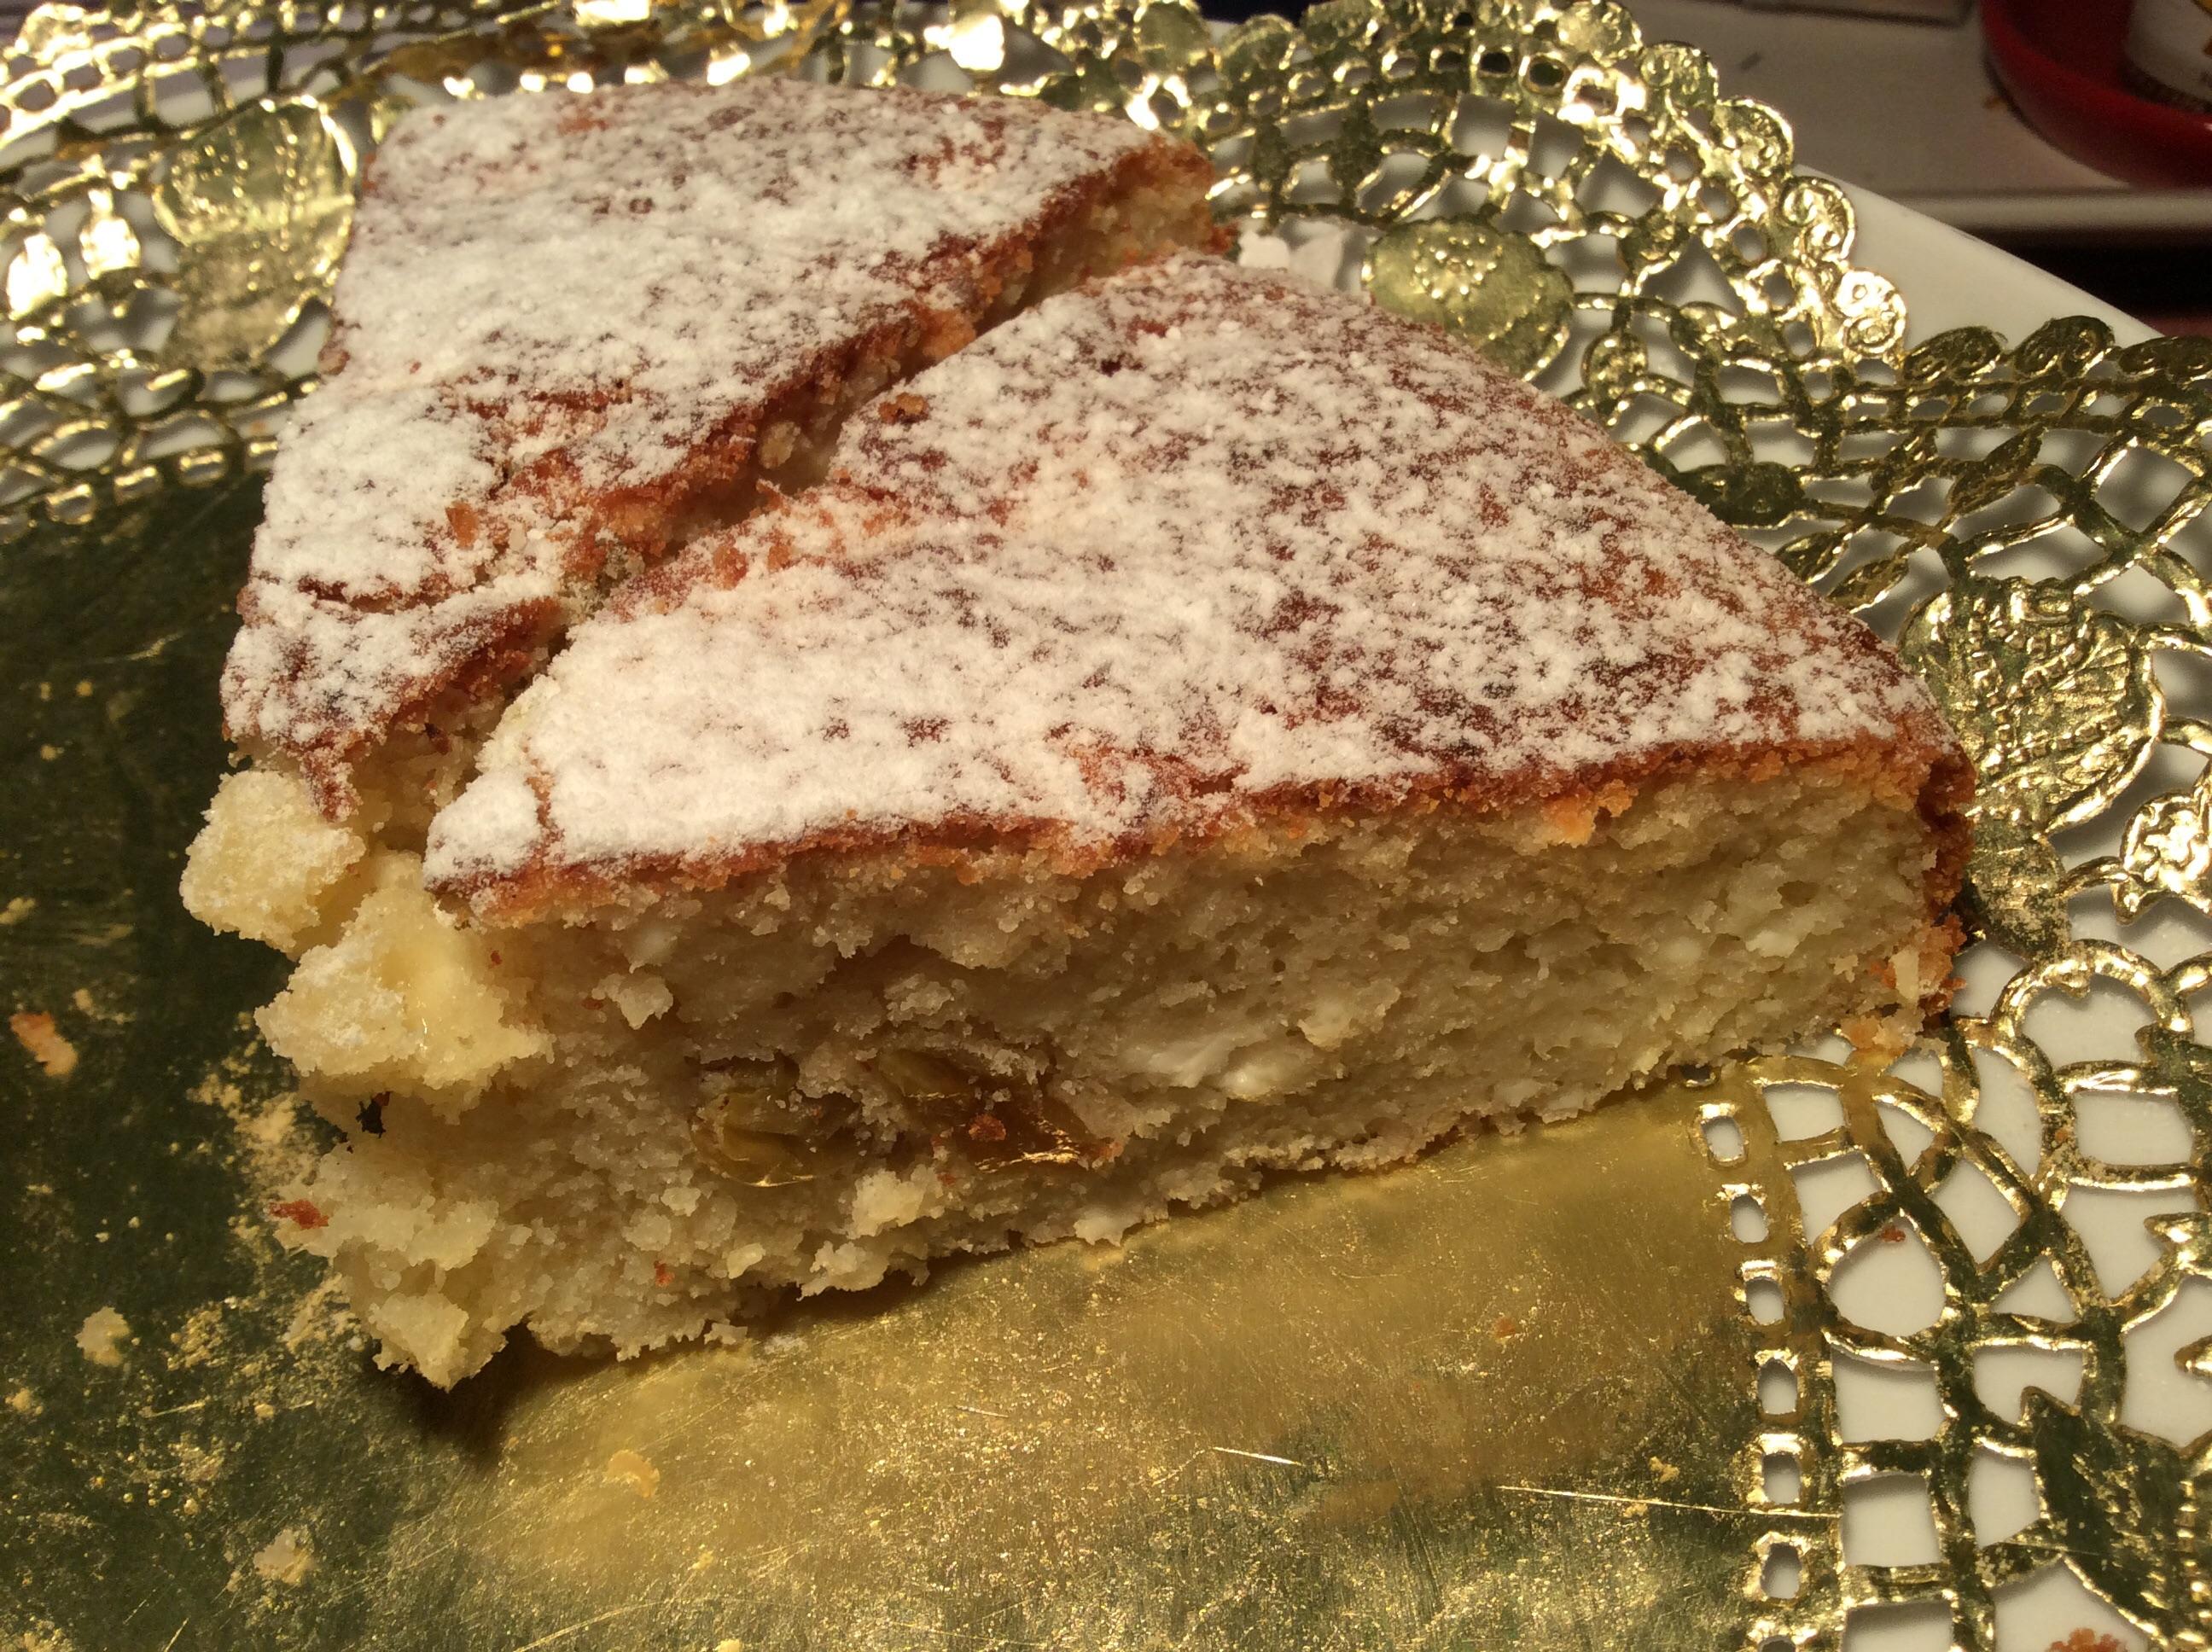 Túrós-mazsolás torta - ფაფუკი კექსი ხაჭოთი